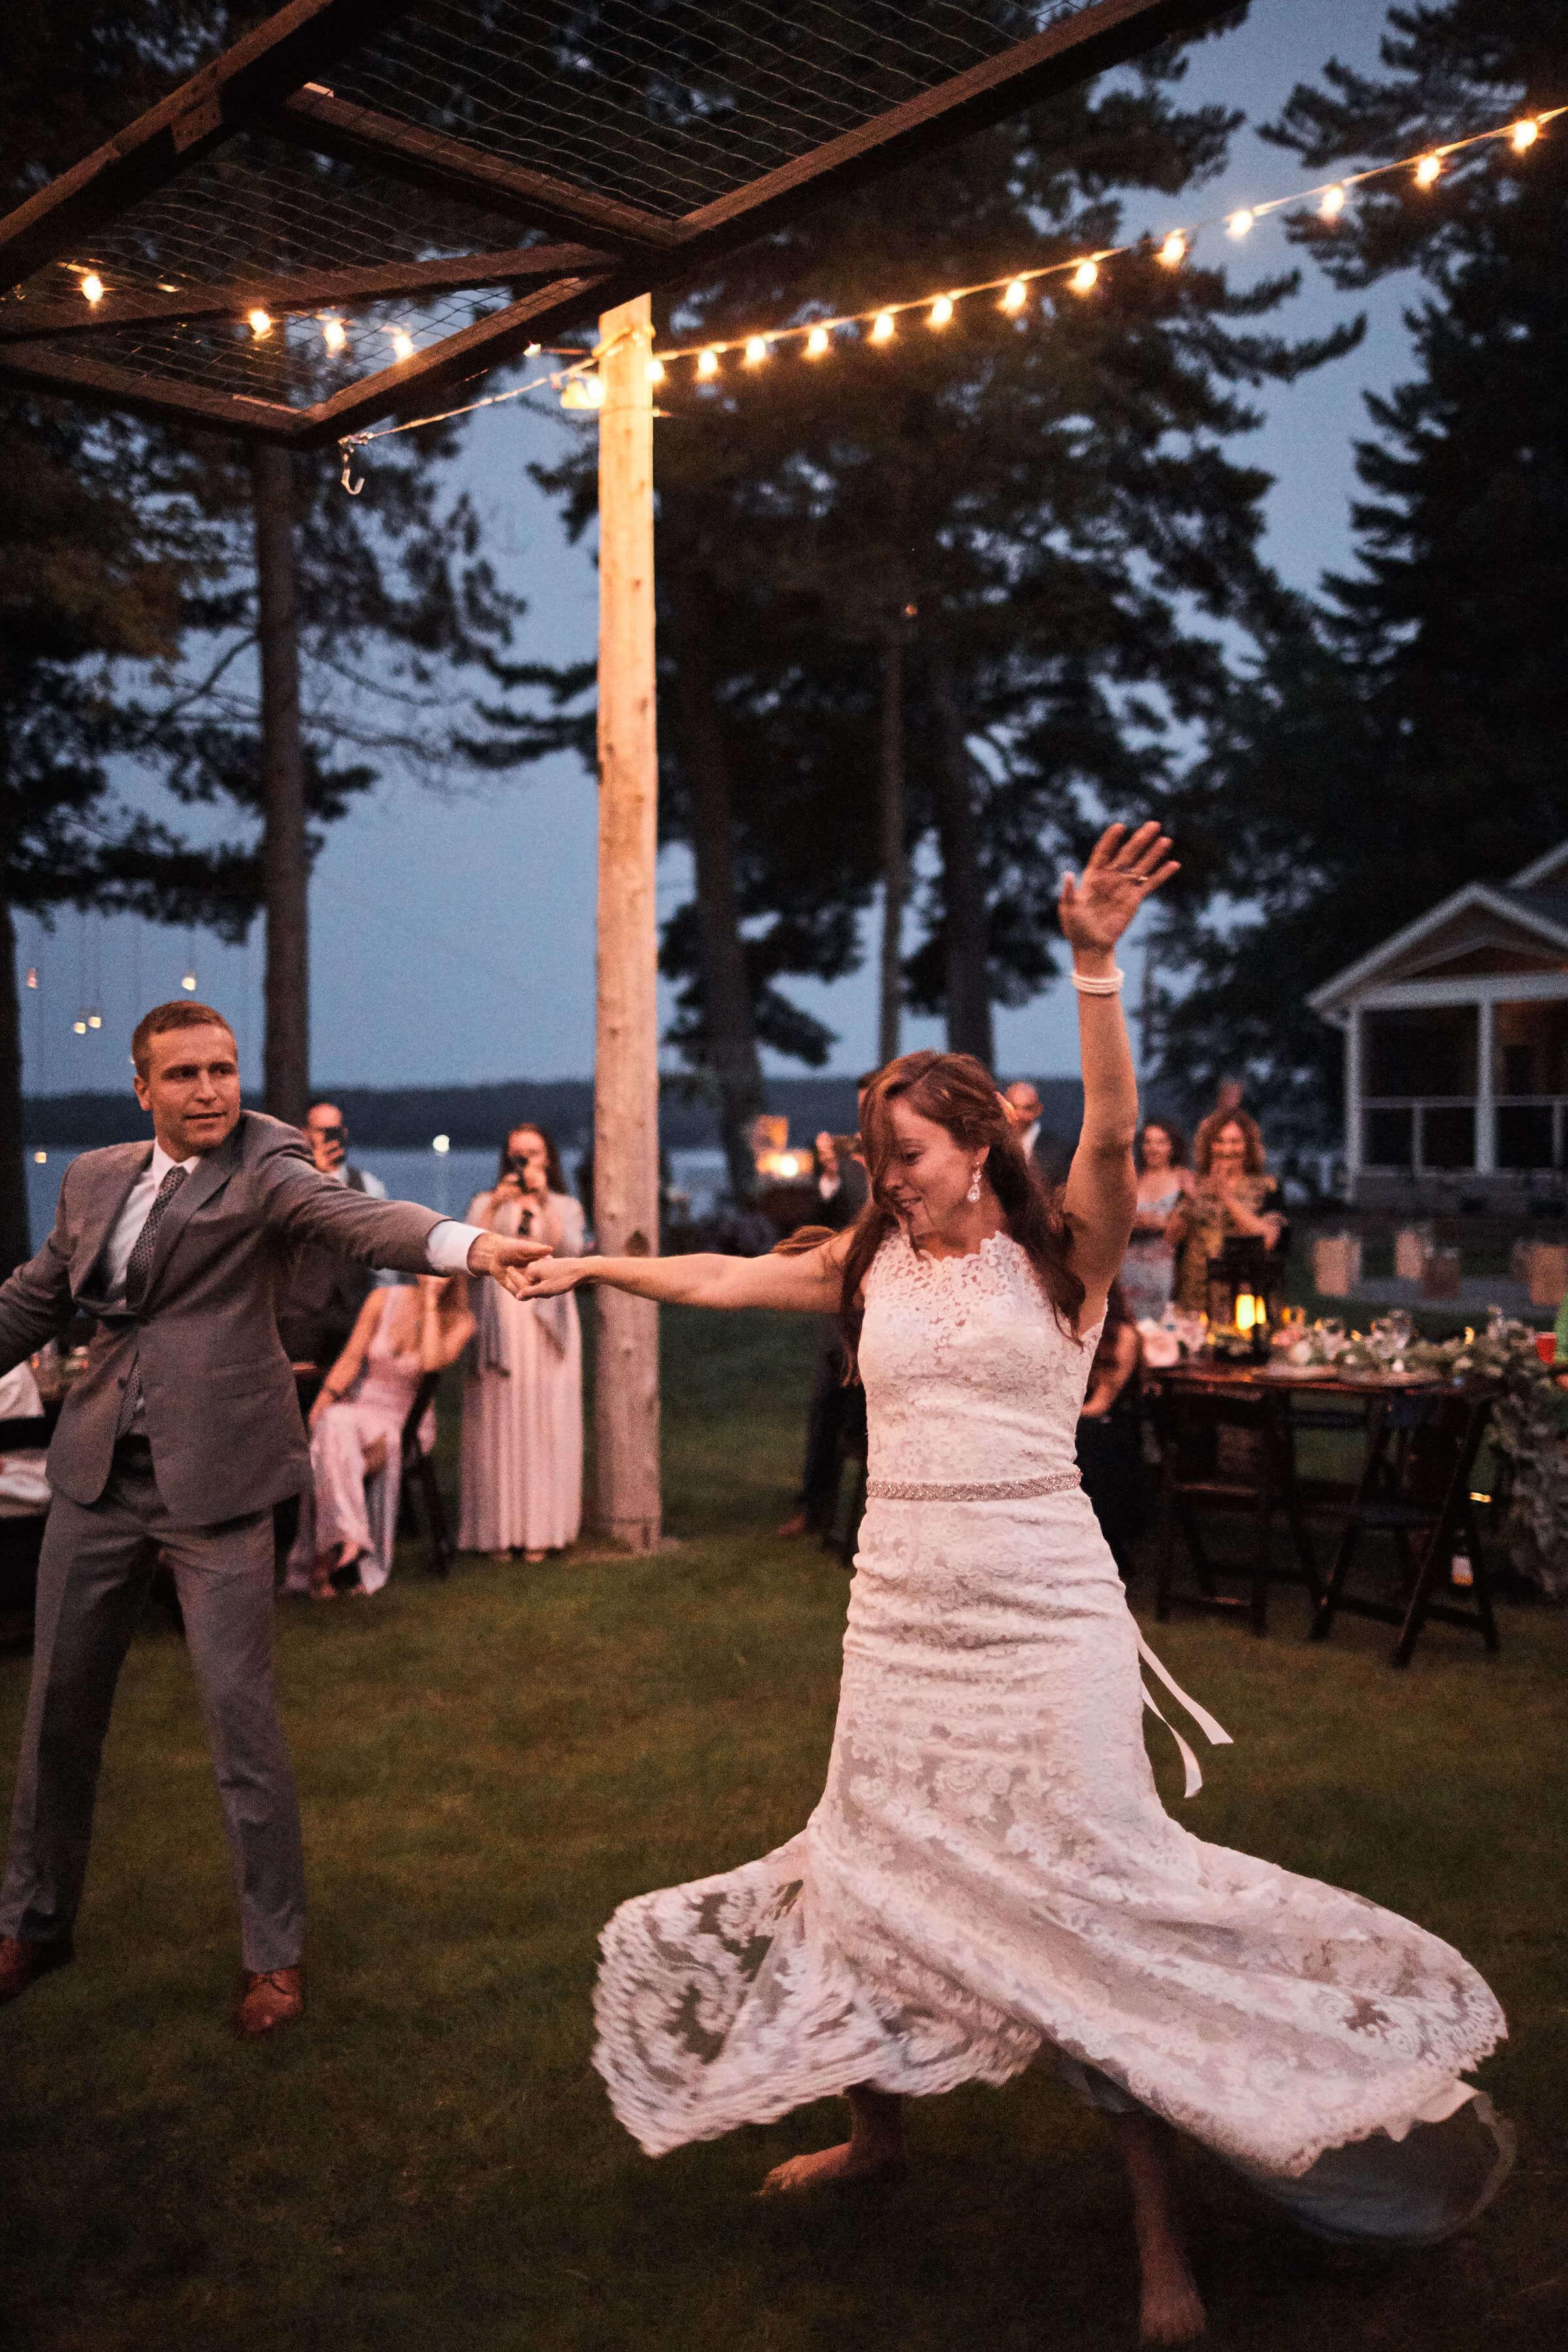 engle-olson-wedding-perry-james-photography-53.jpg